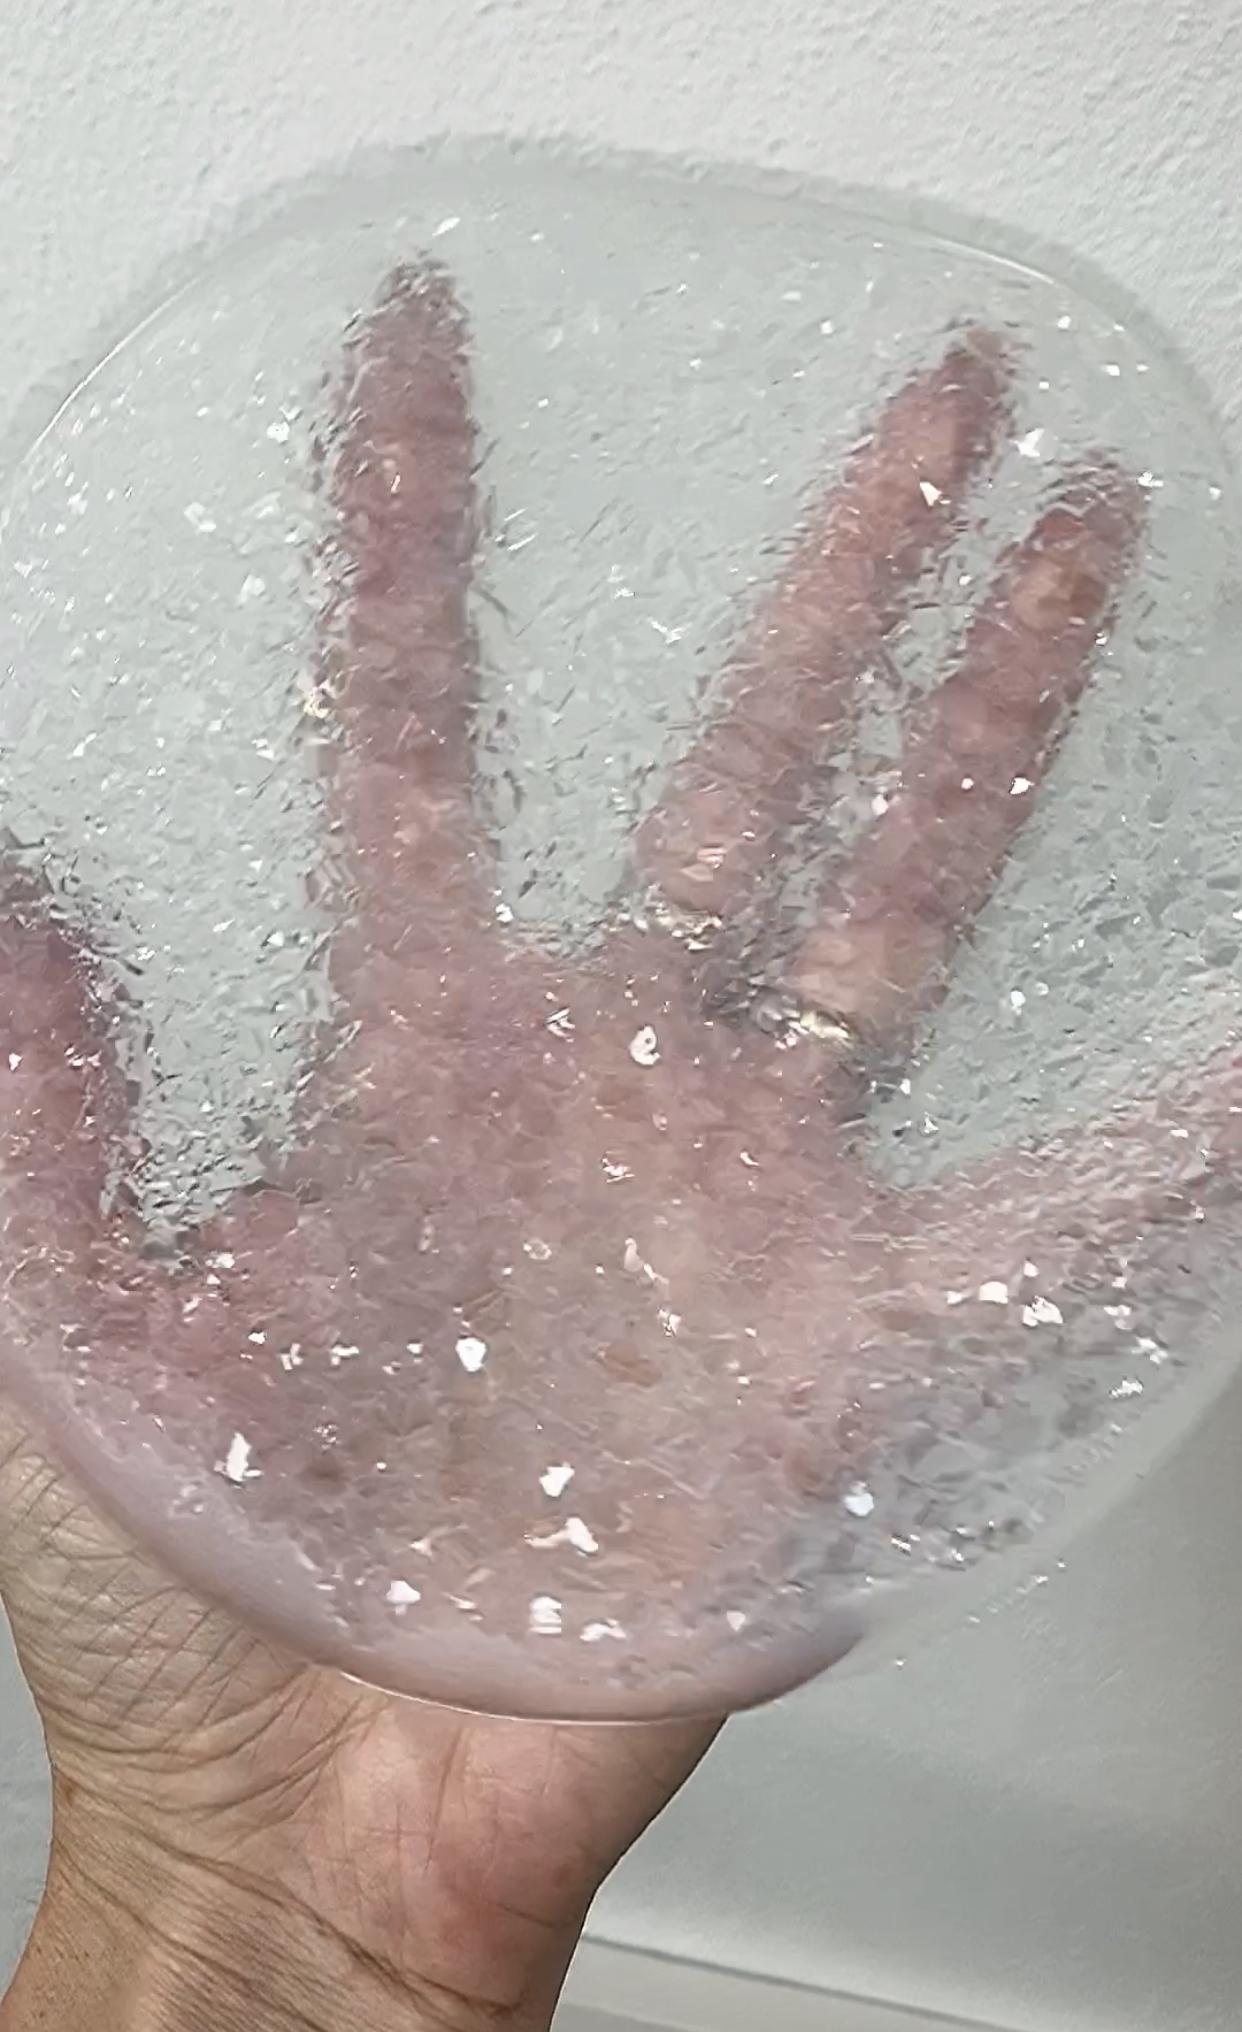 17cm Crystal Rug, Crystal Silikon Mold für Tablets und Platten